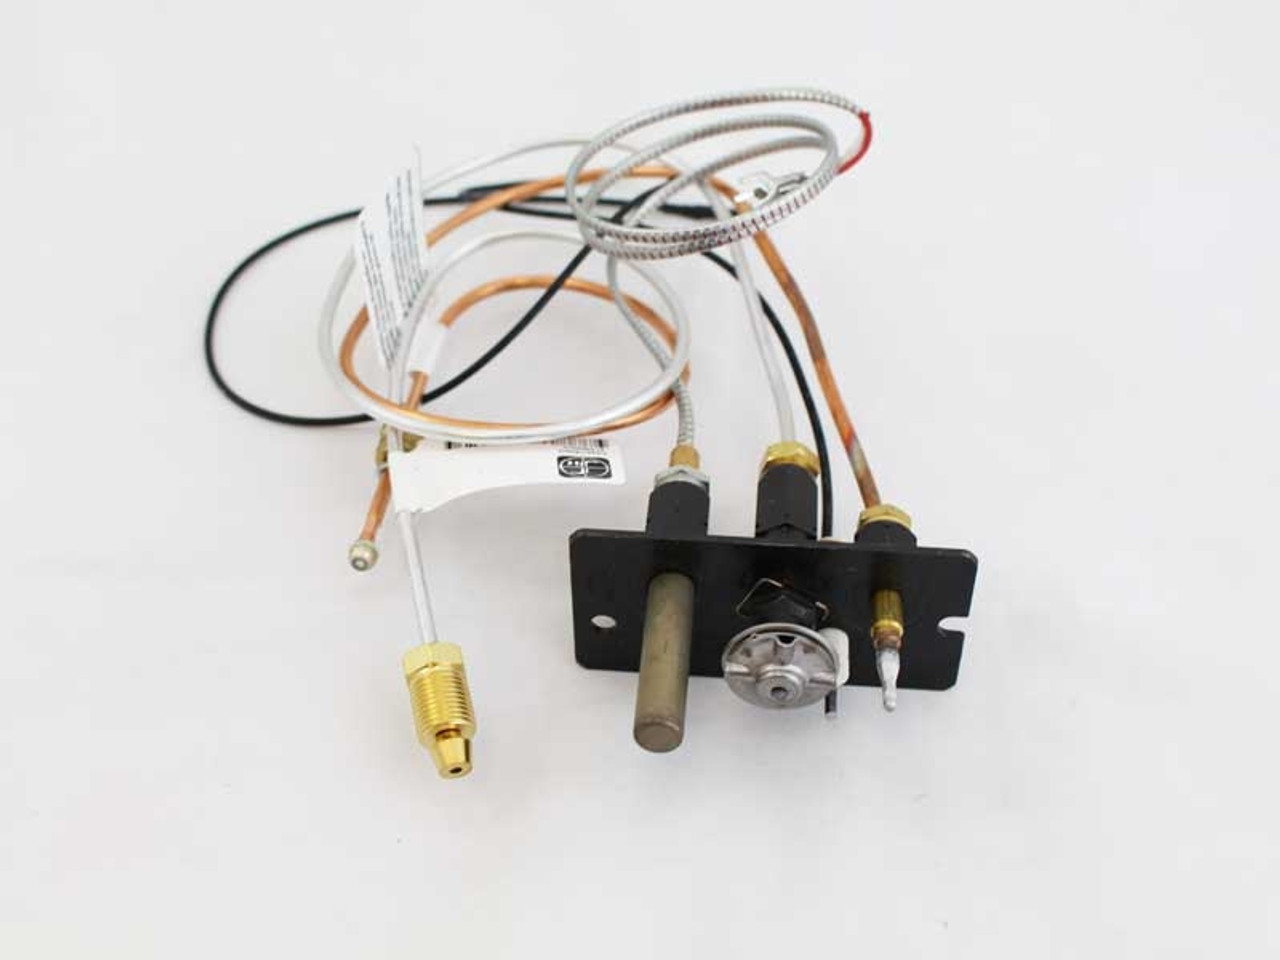 10002265 2__65708.1493888200 thermopile gas valve wiring diagram turcolea com thermopile gas valve wiring diagram at soozxer.org